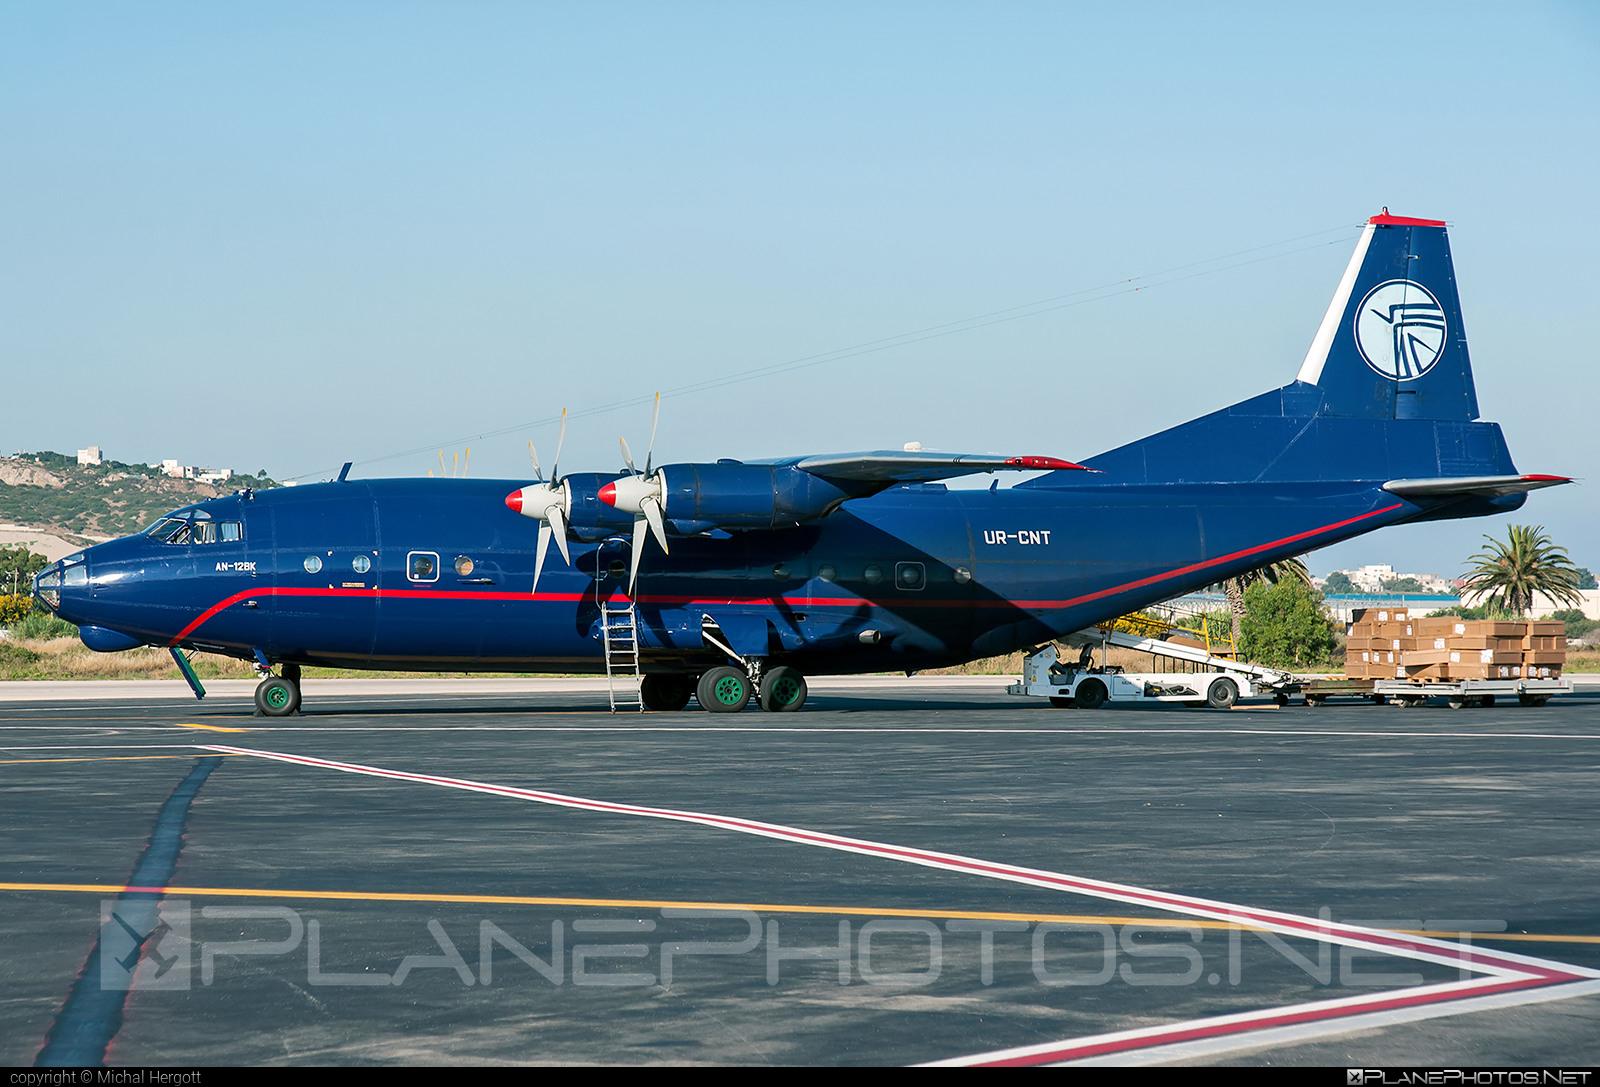 Antonov An-12BK - UR-CNT operated by Ukraine Air Alliance (UAA) #an12 #an12bk #antonov #antonov12